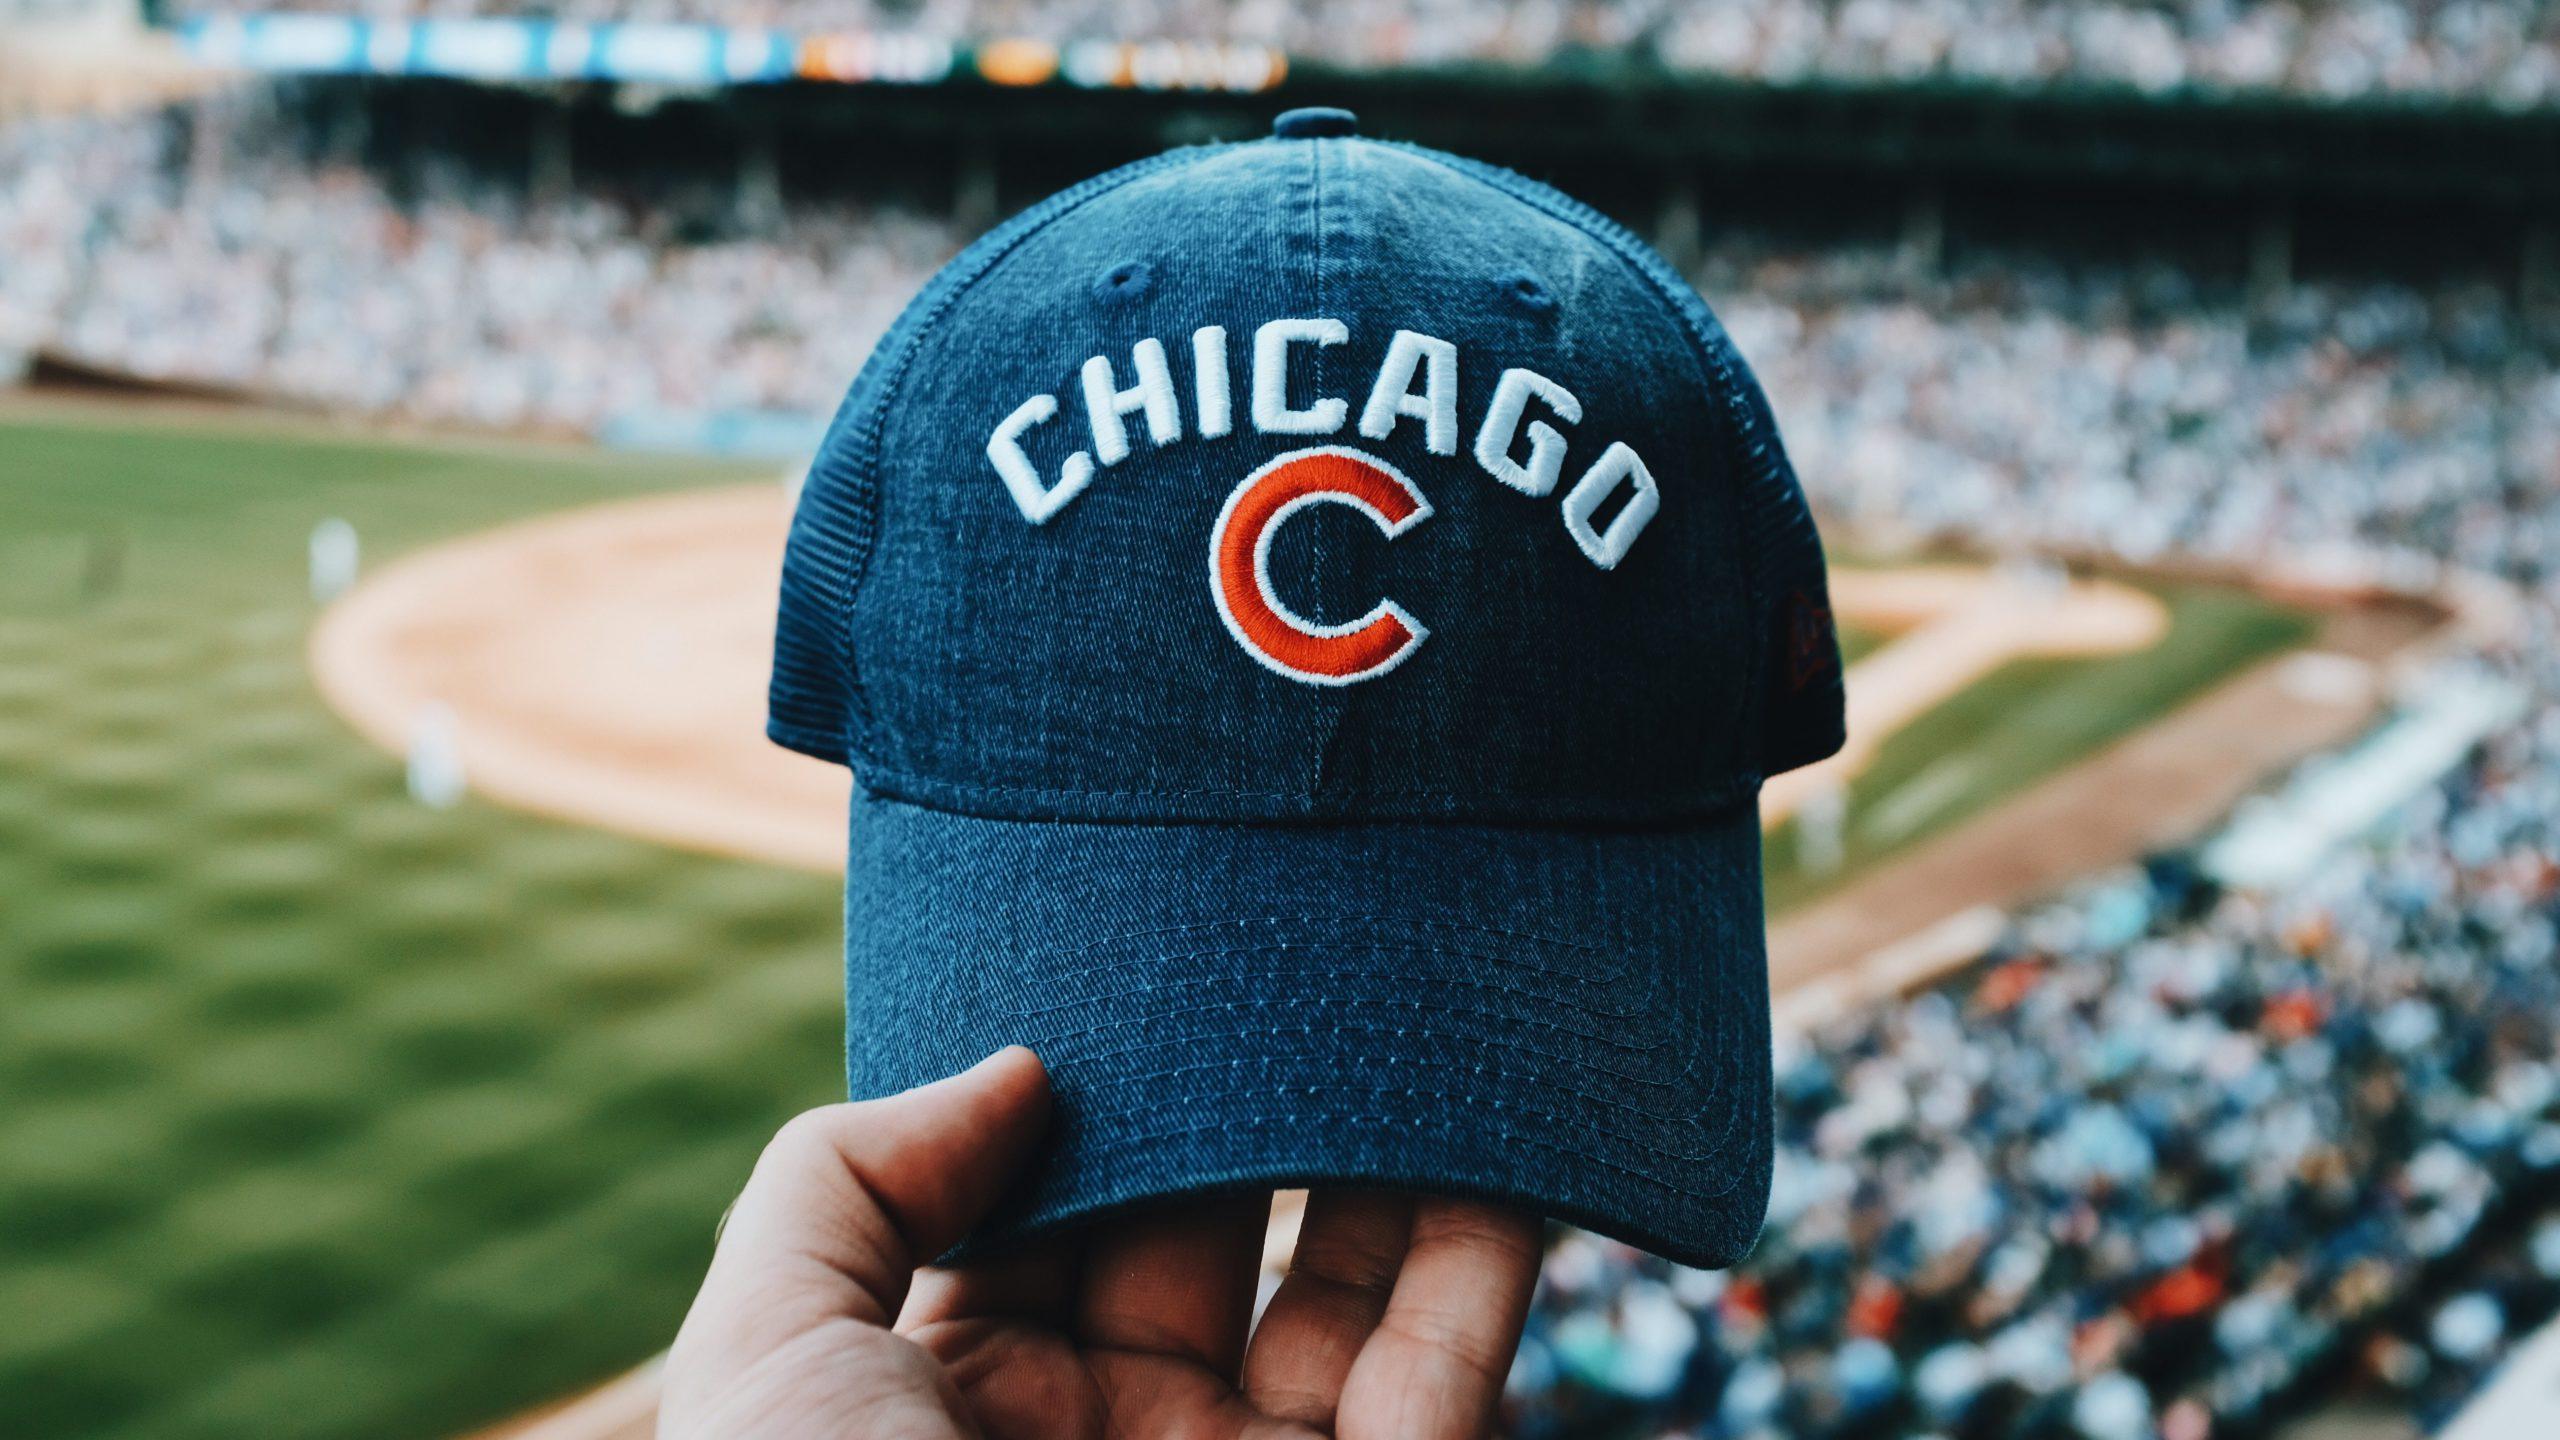 Chicago Cubs baseball hat